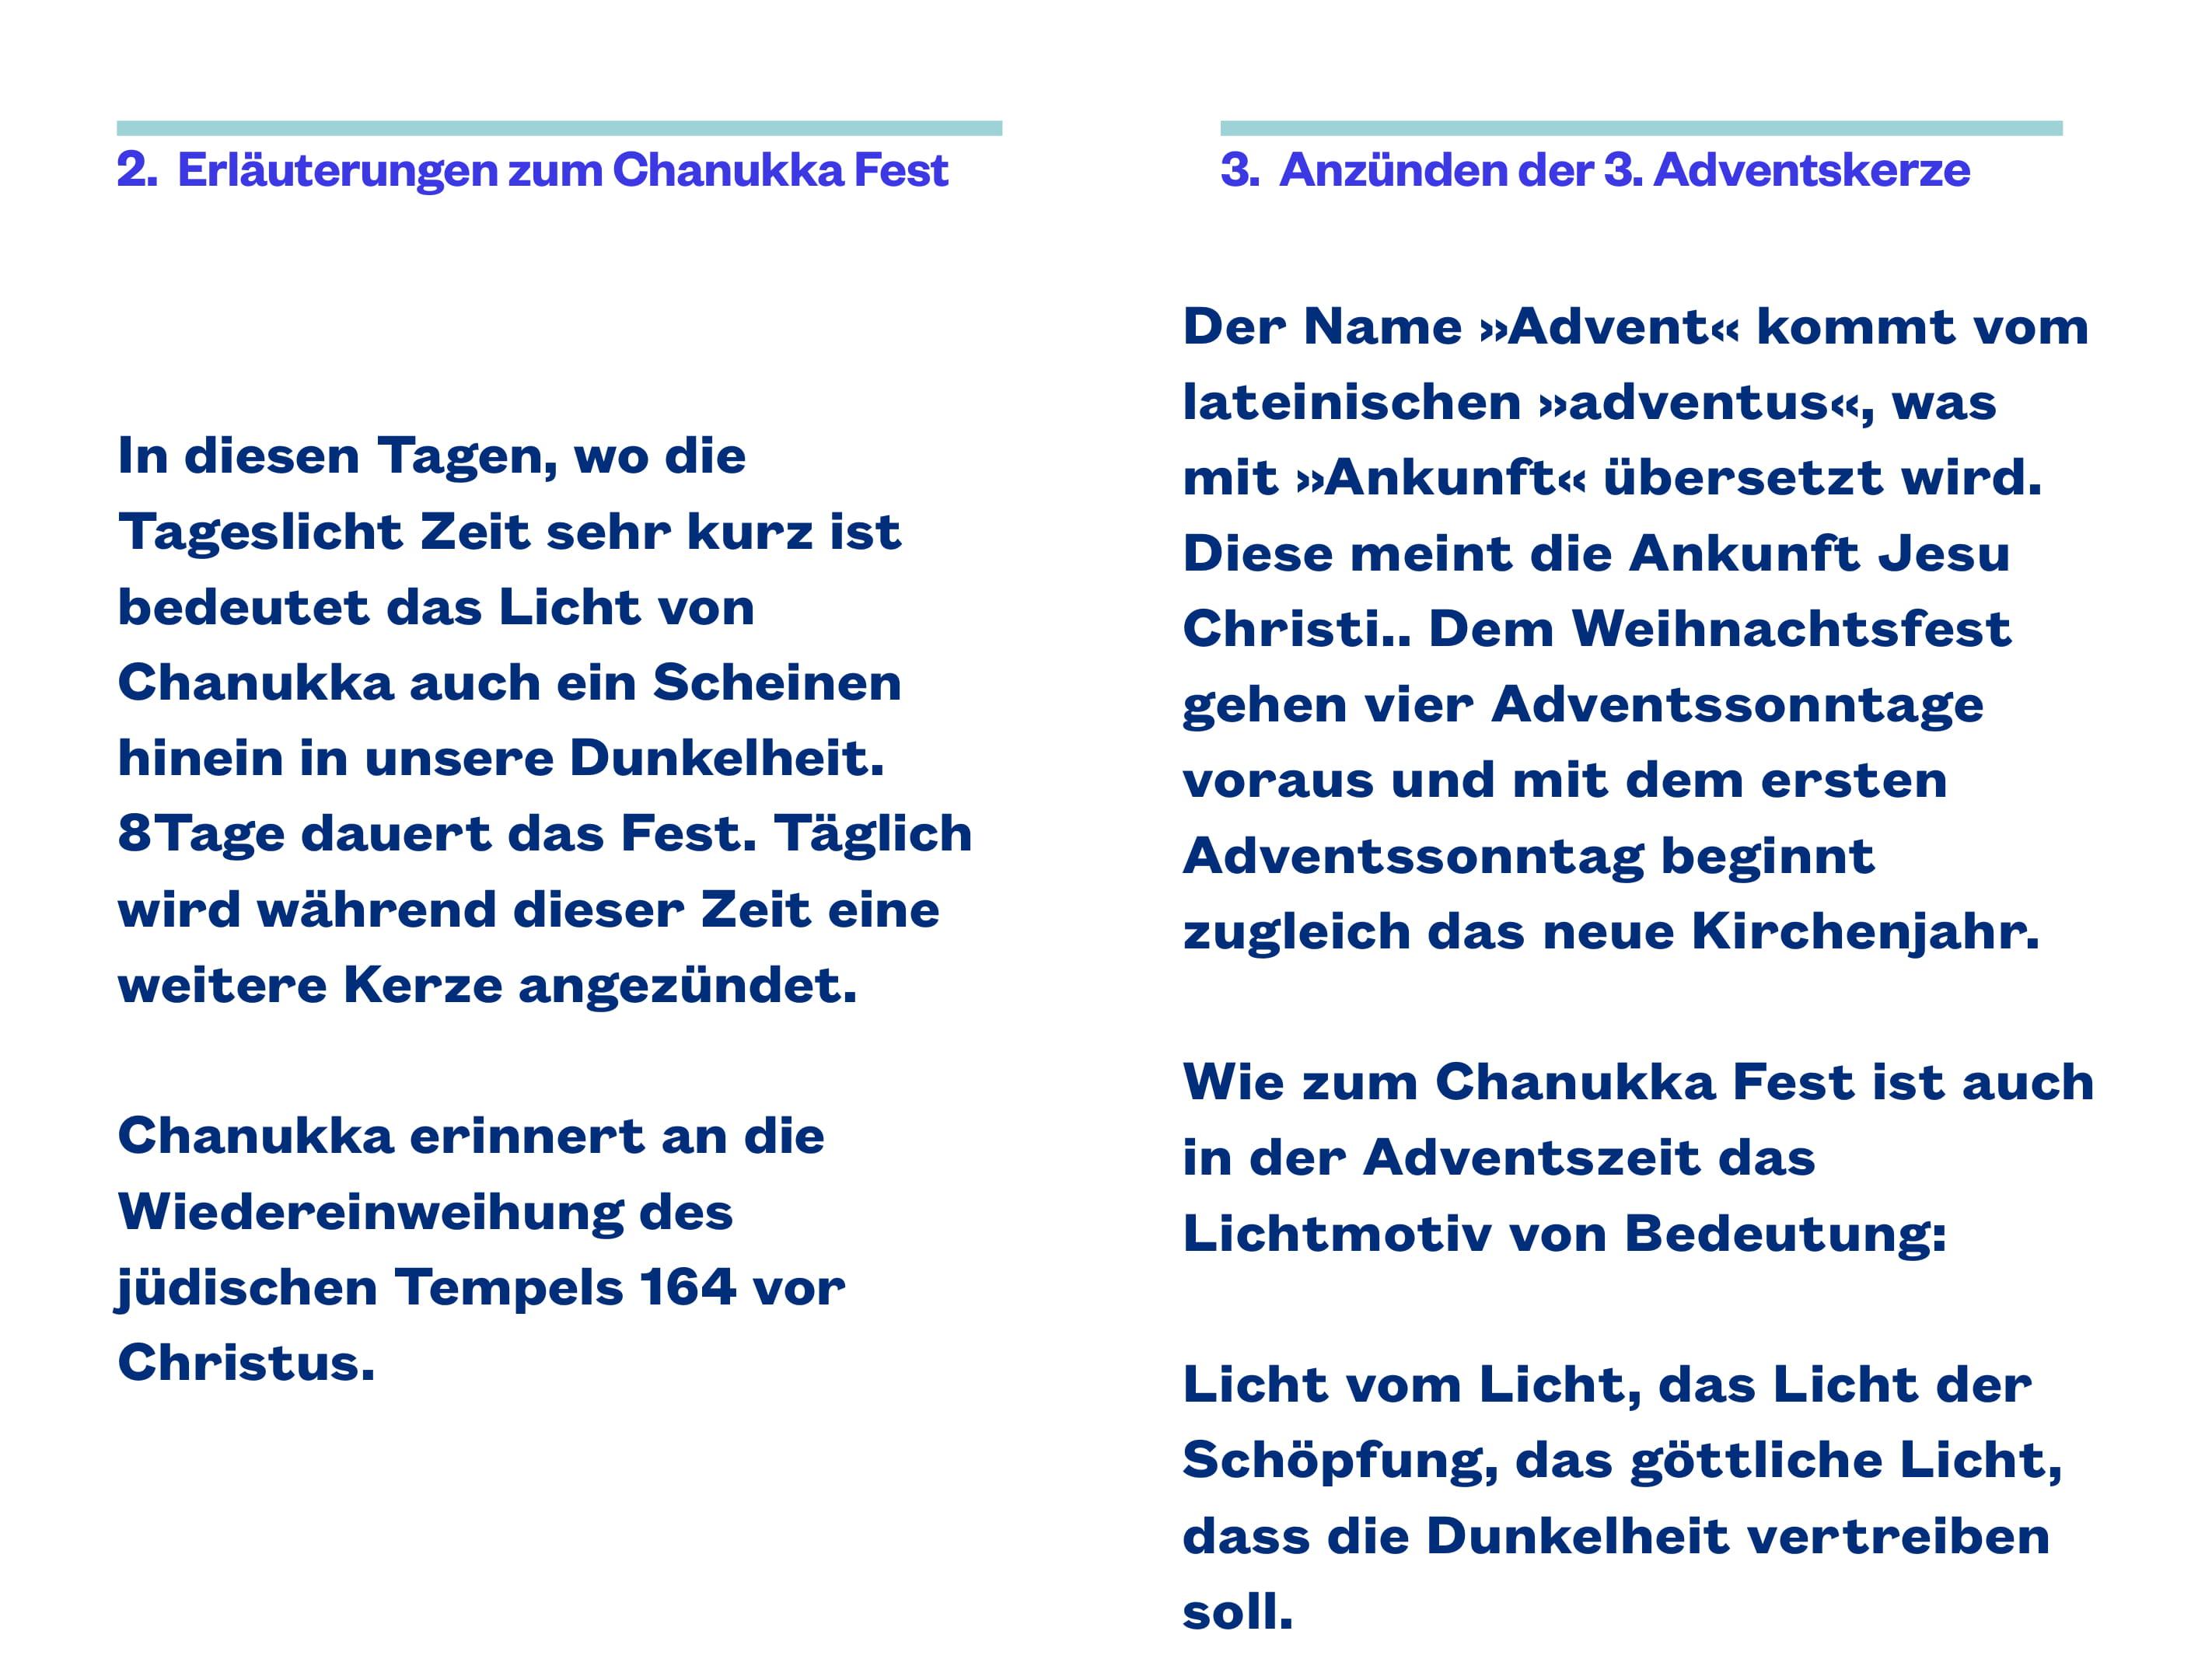 2021-03-11-chanuka-adwent-berlin-warszawa-3.jpg